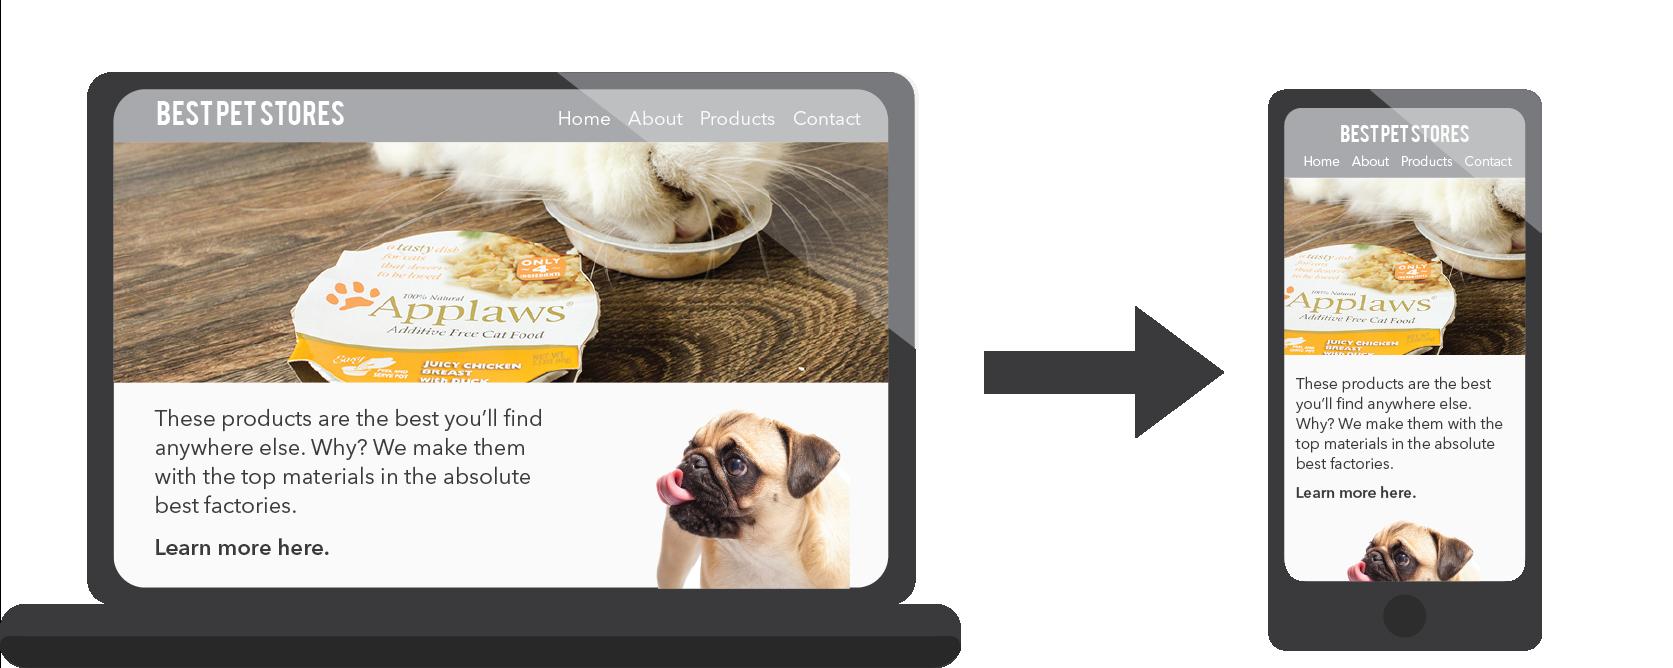 mobile-friendly-website-pet-business-marketing